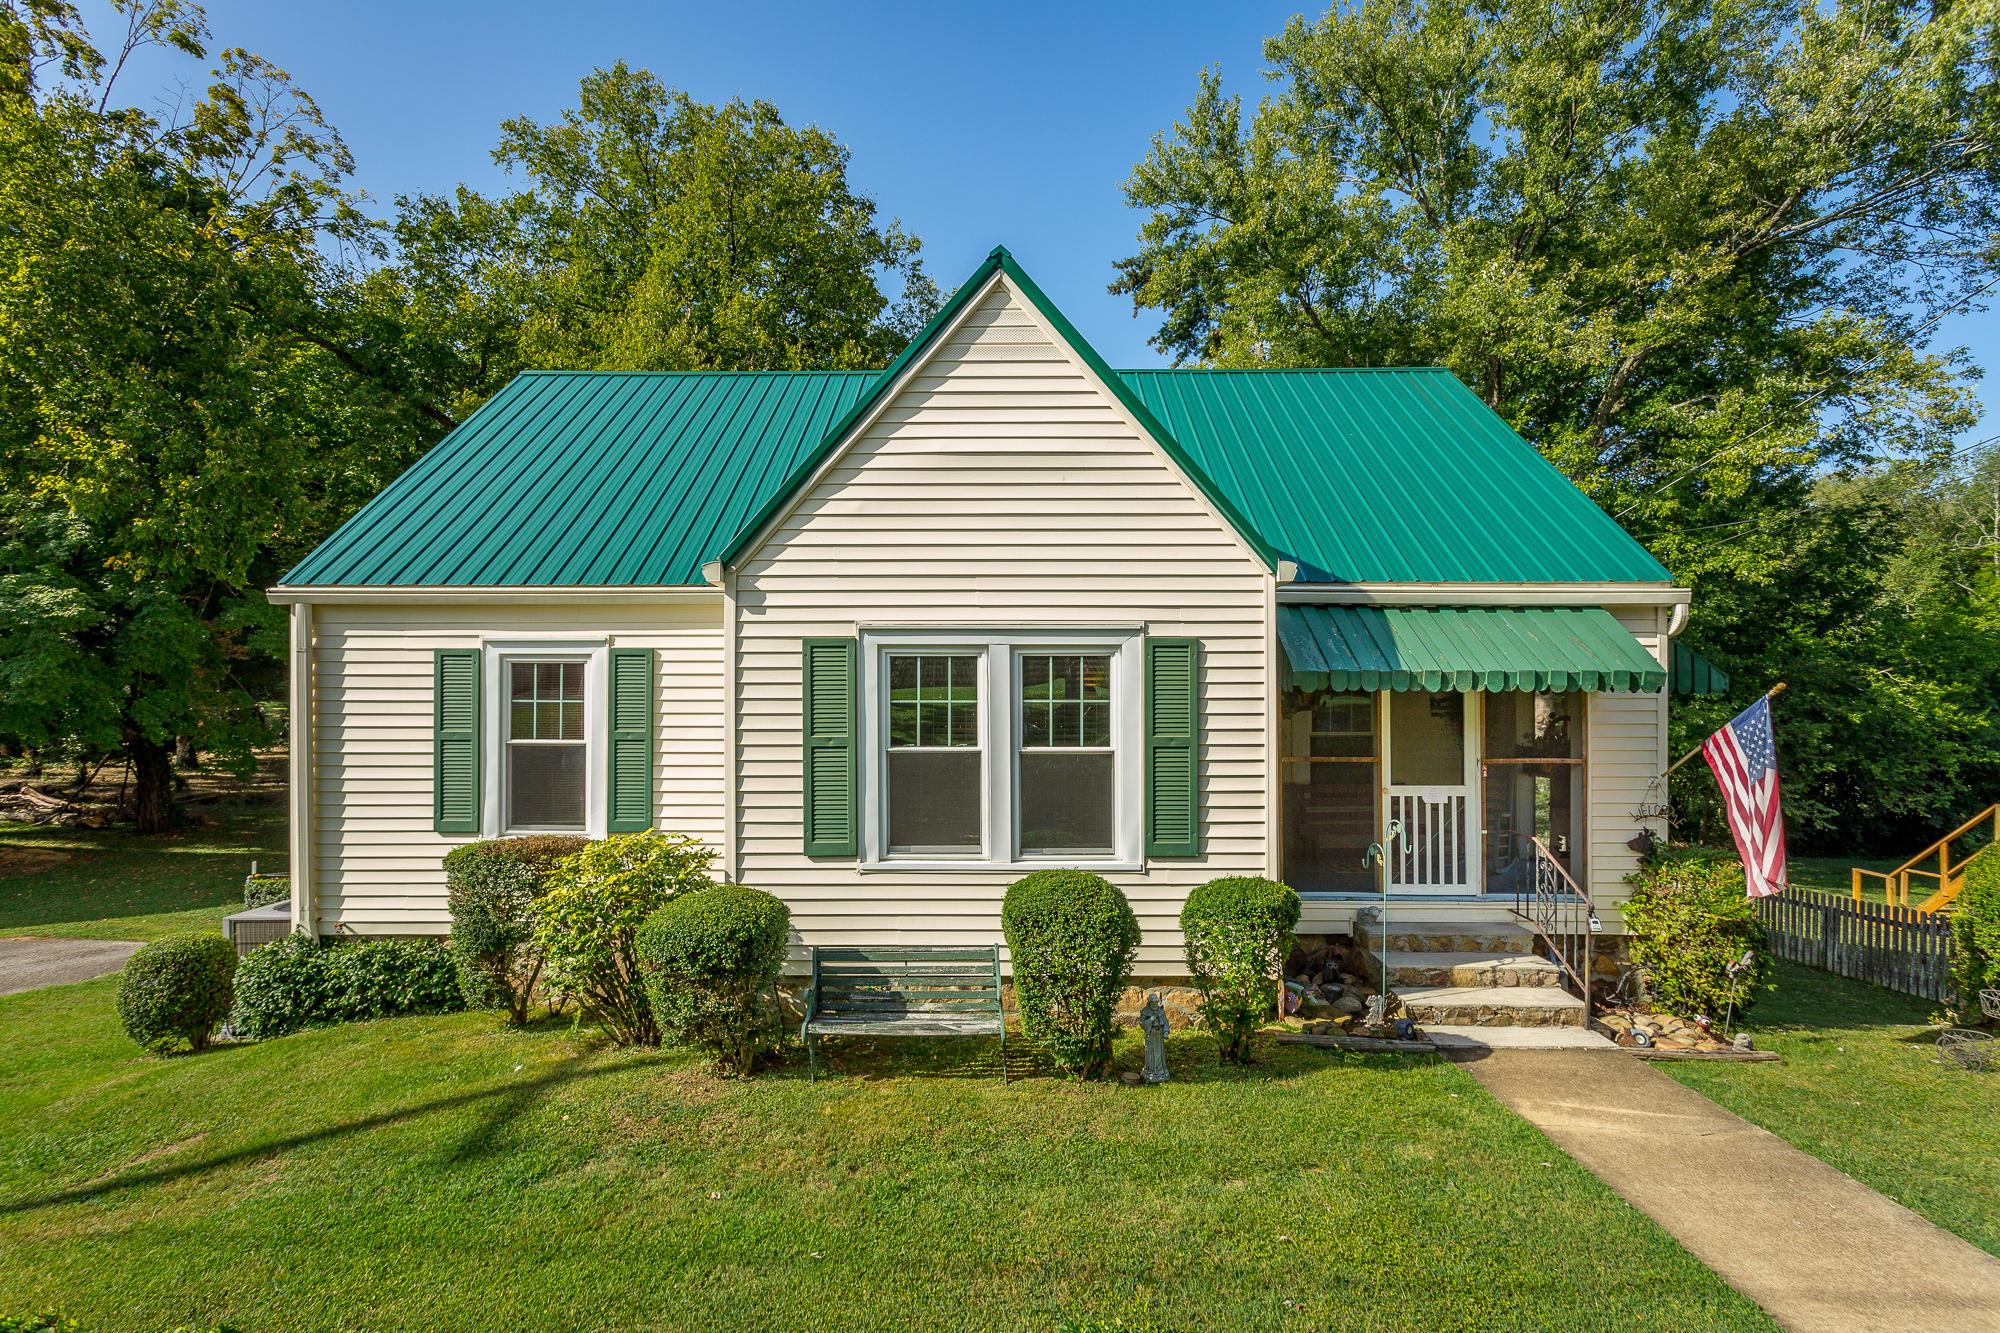 210 Baxter St, Chattanooga, TN 37415